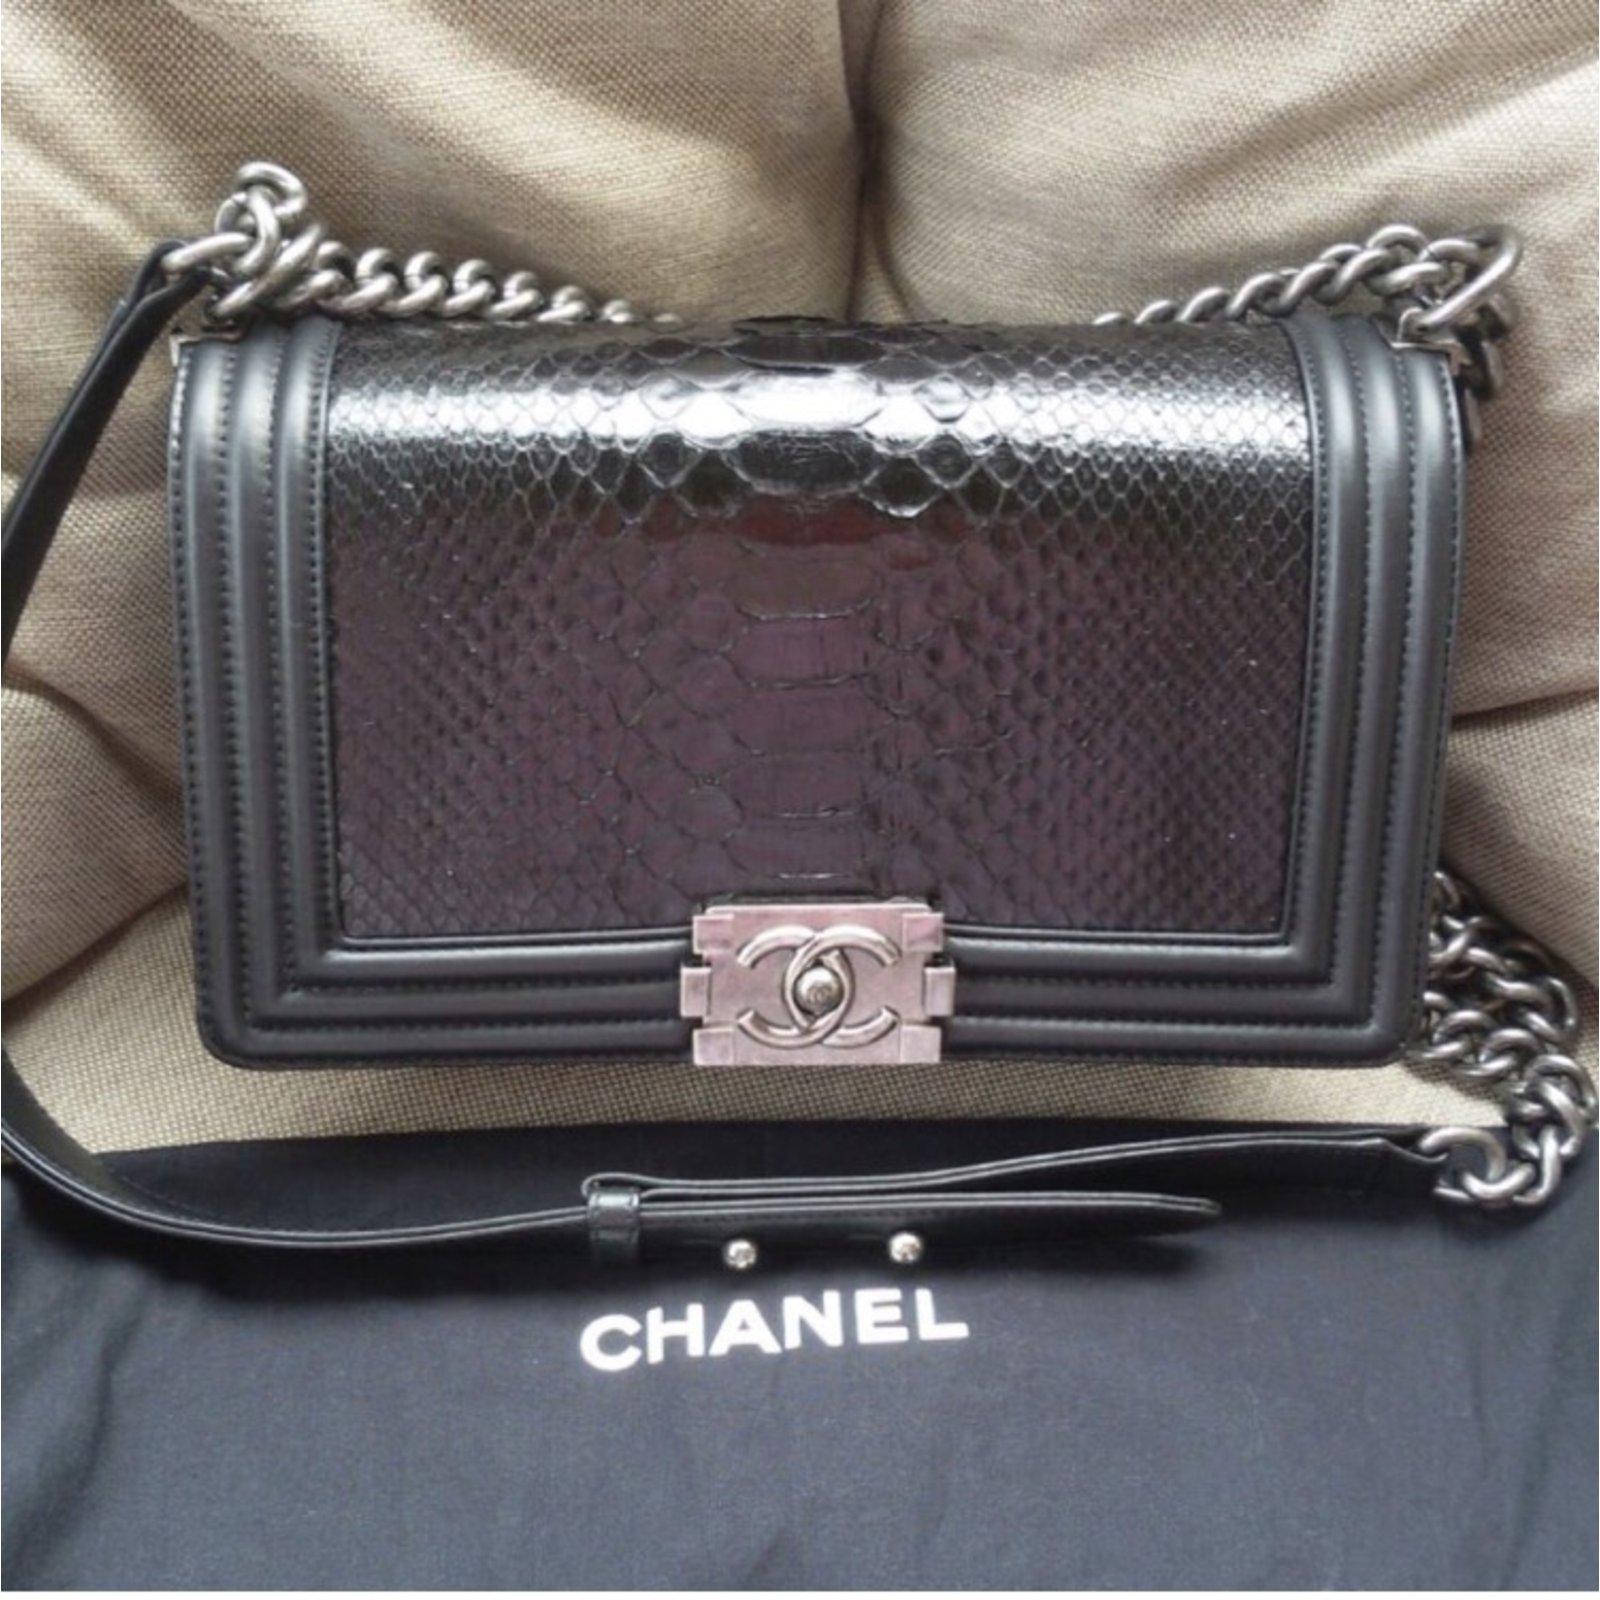 afd209bcb4ca2f Chanel Boy pyhton Handbags Exotic leather Black ref.49170 - Joli Closet